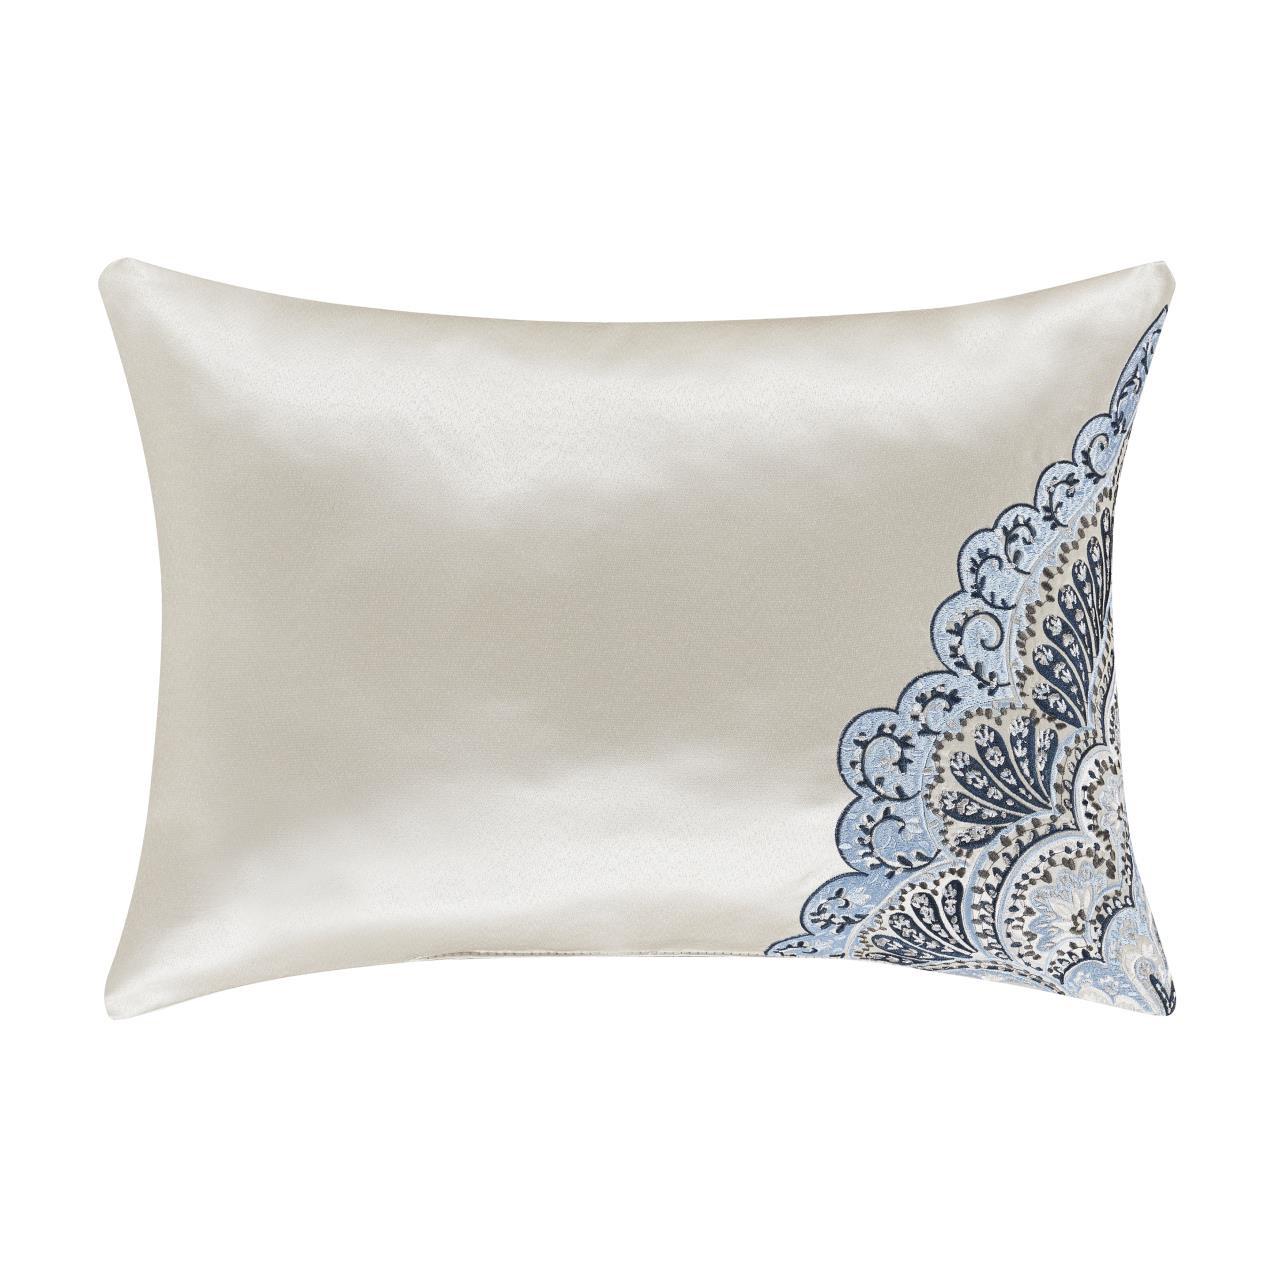 Alexis Powder Blue Boudoir Pillow - 193842108567